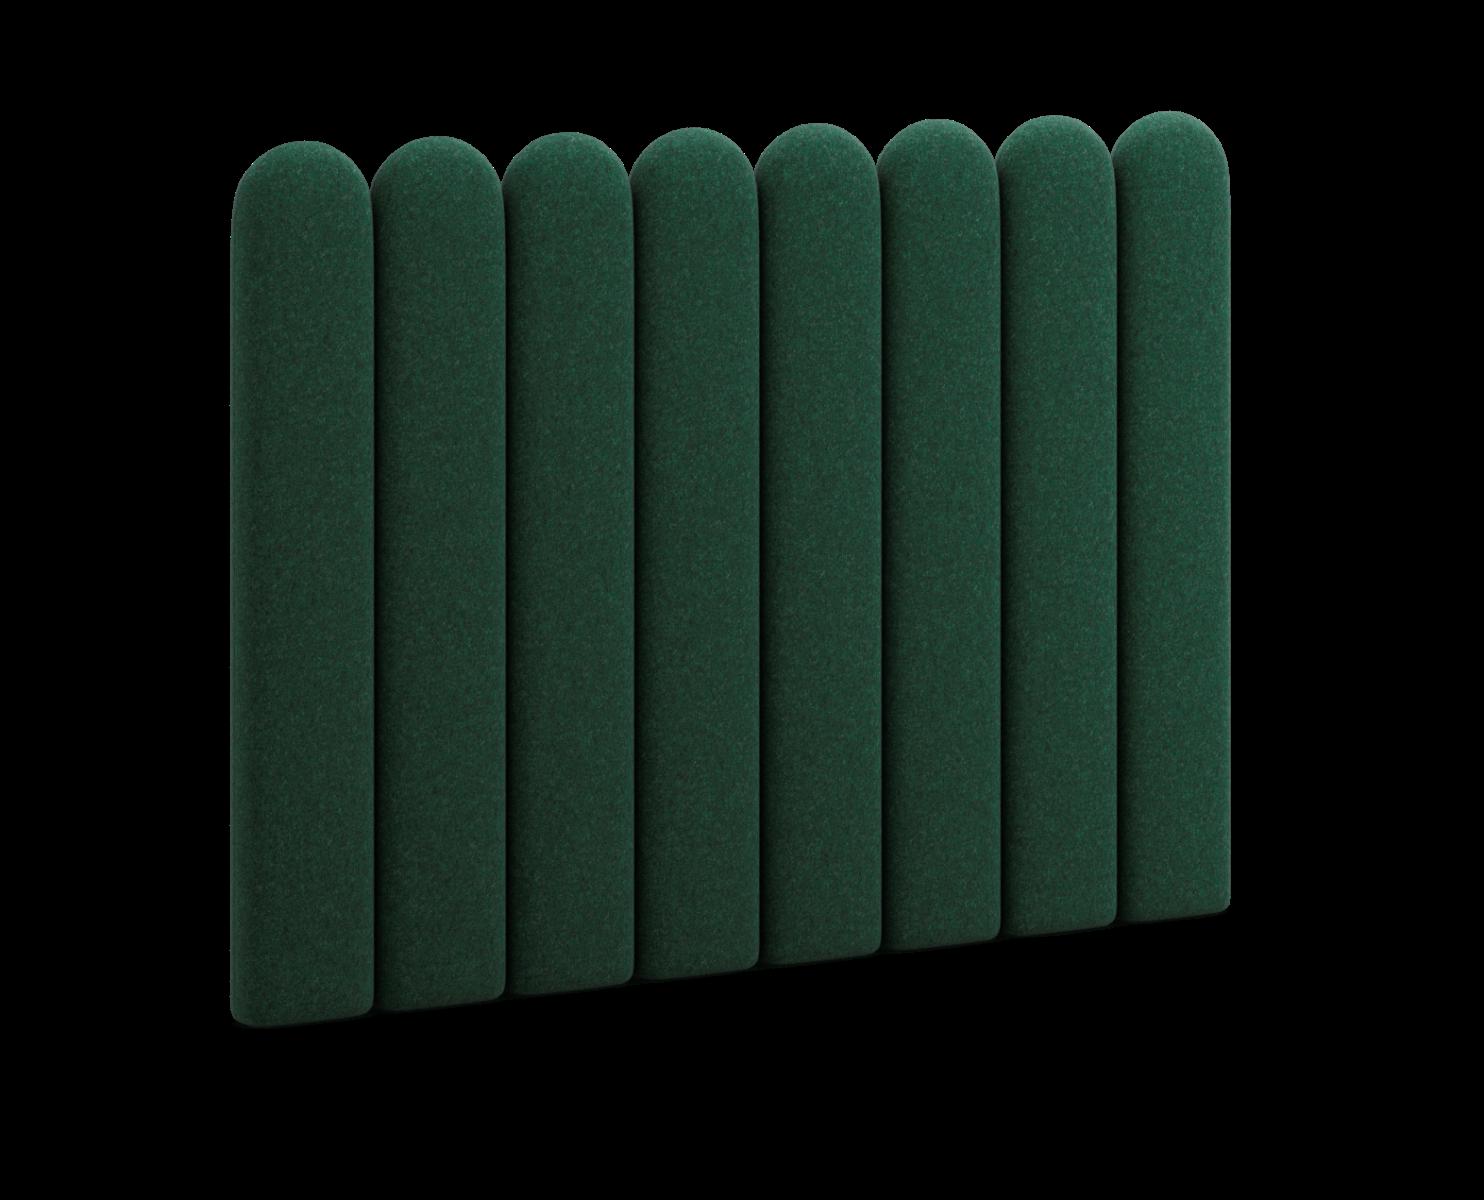 Køb Ovia Fluctus - 160x120x6 Grønn